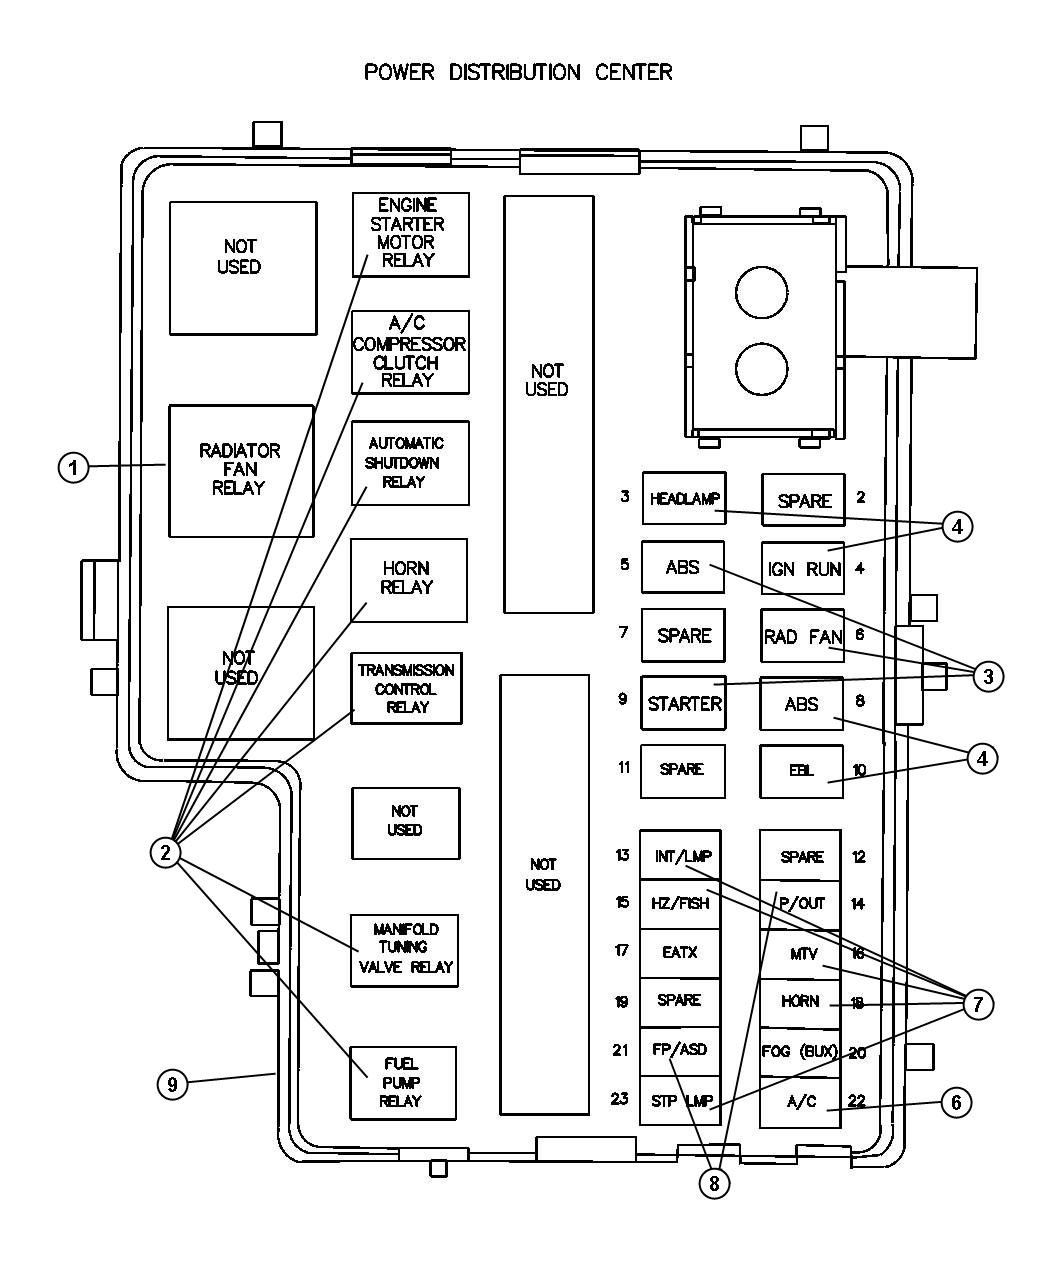 2007 honda odyssey stereo wiring diagram 2007 discover your 1998 dodge stratus radio wiring diagram